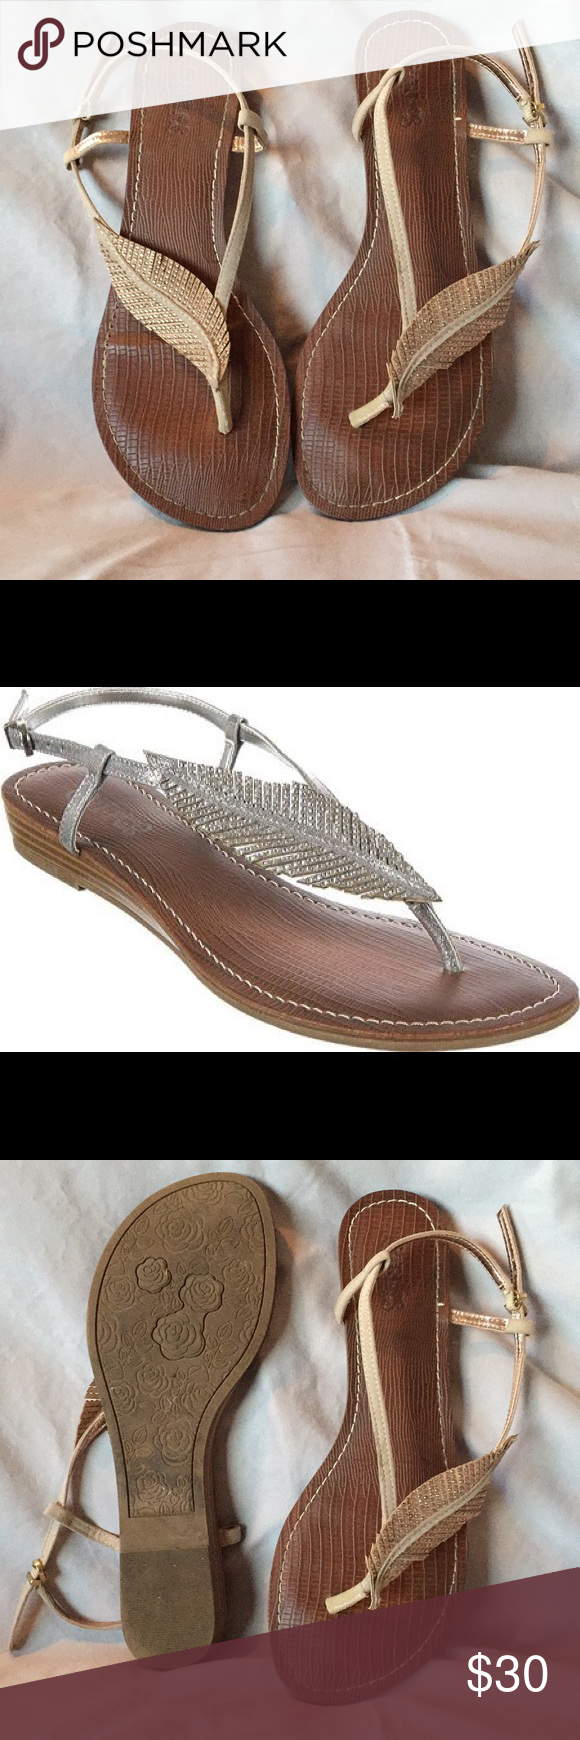 b881e1473c91 Carlos Santana Tandy Sparkle Leaf Sandals The Tandy flat thong sandal  features a elegant leaf embellishment on the vamp. Carlos Santana Shoes  Sandals